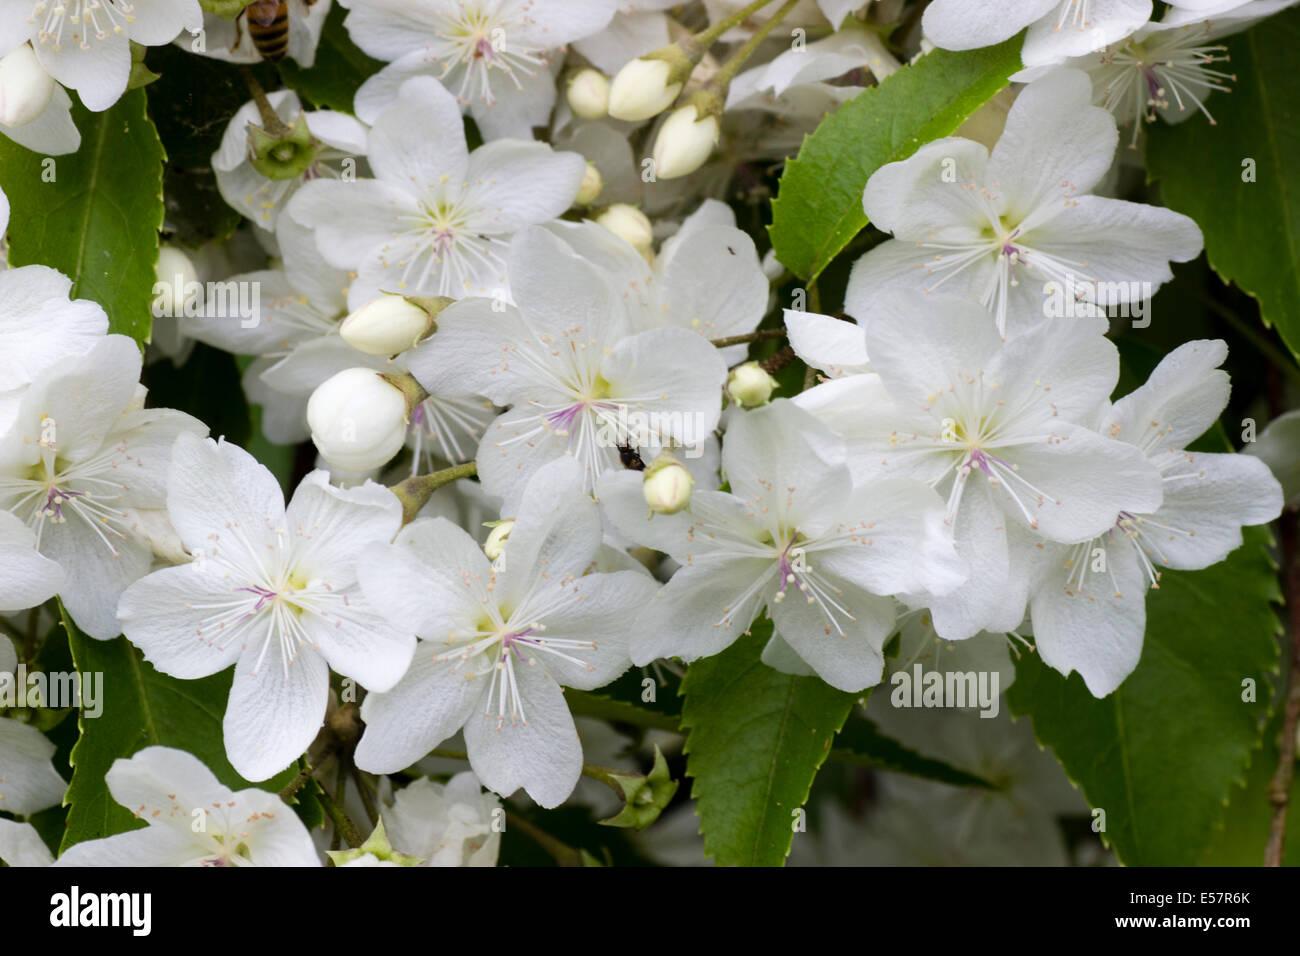 Hoheria glory of amlwch stock photos hoheria glory of amlwch stock massed white flowers of the summer flowering hardy tree hoheria glory of amlwch mightylinksfo